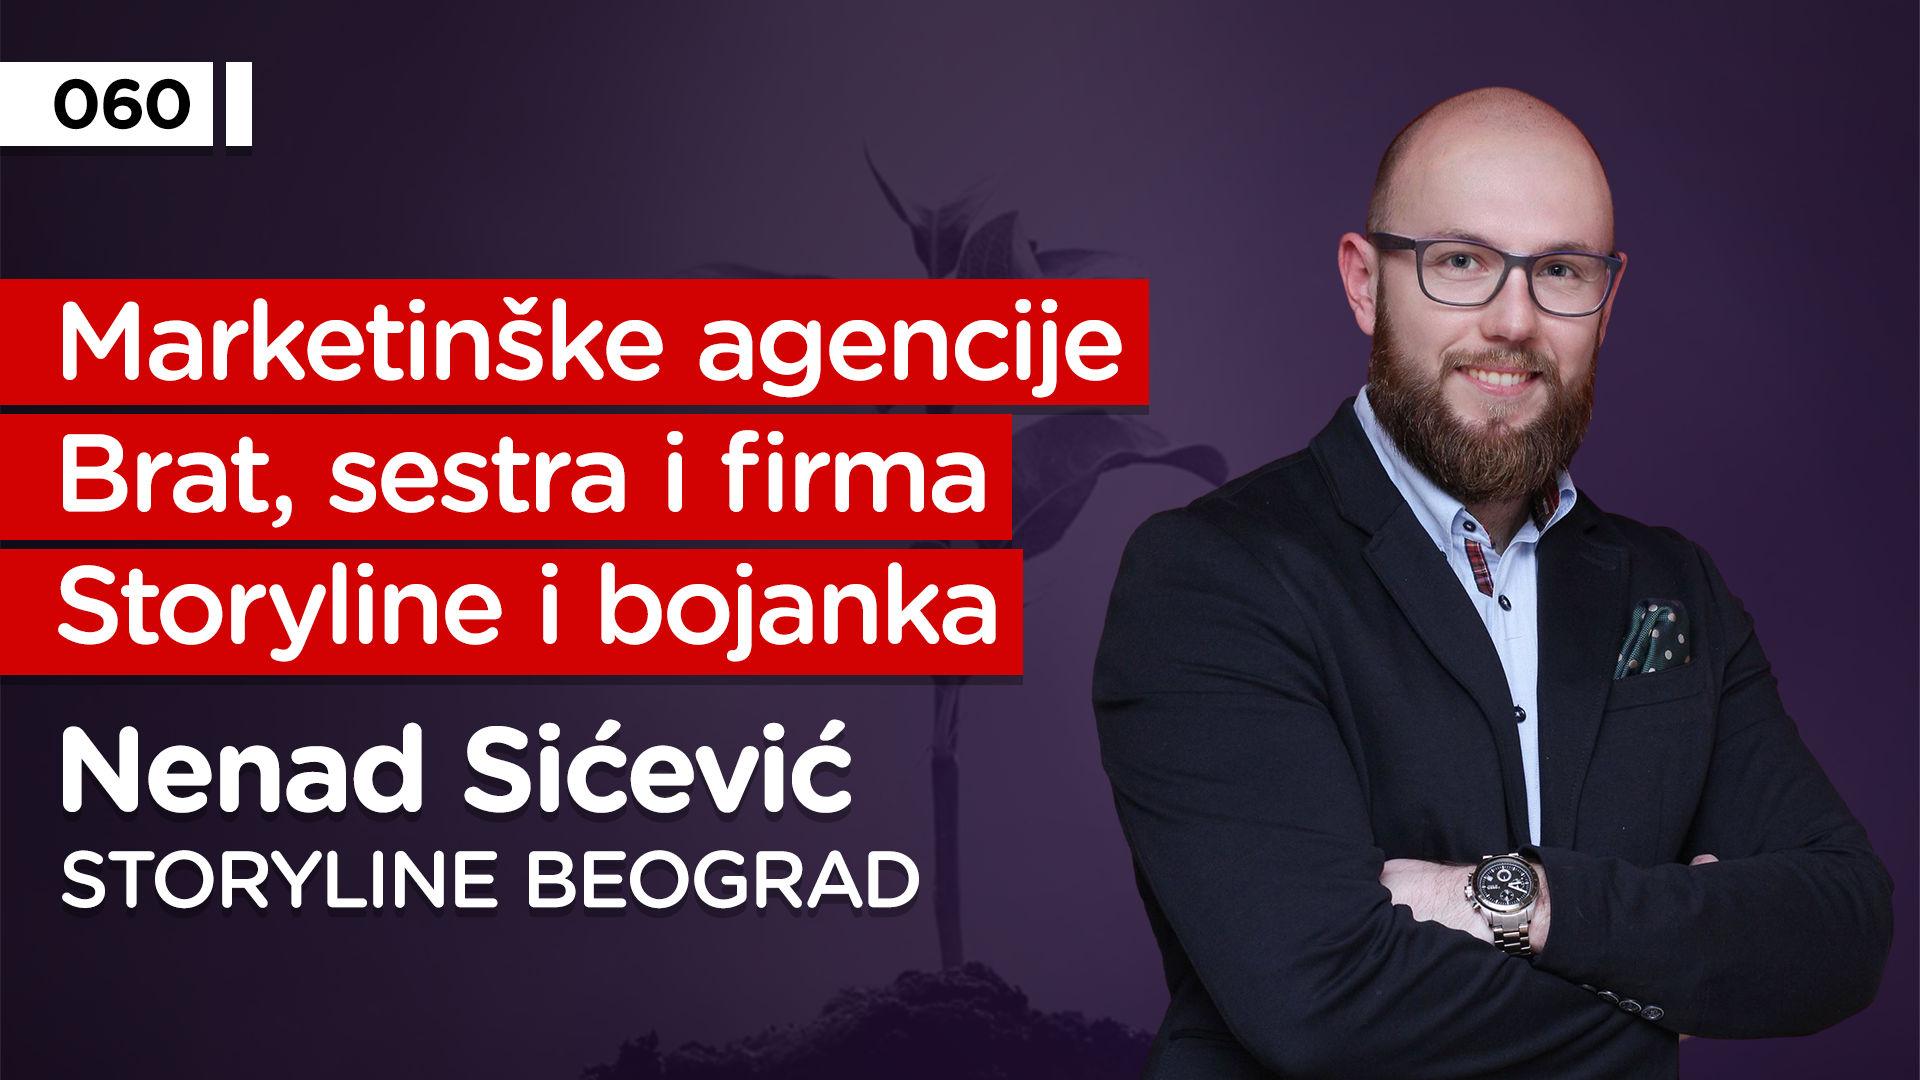 EP060: Nenad Sićević